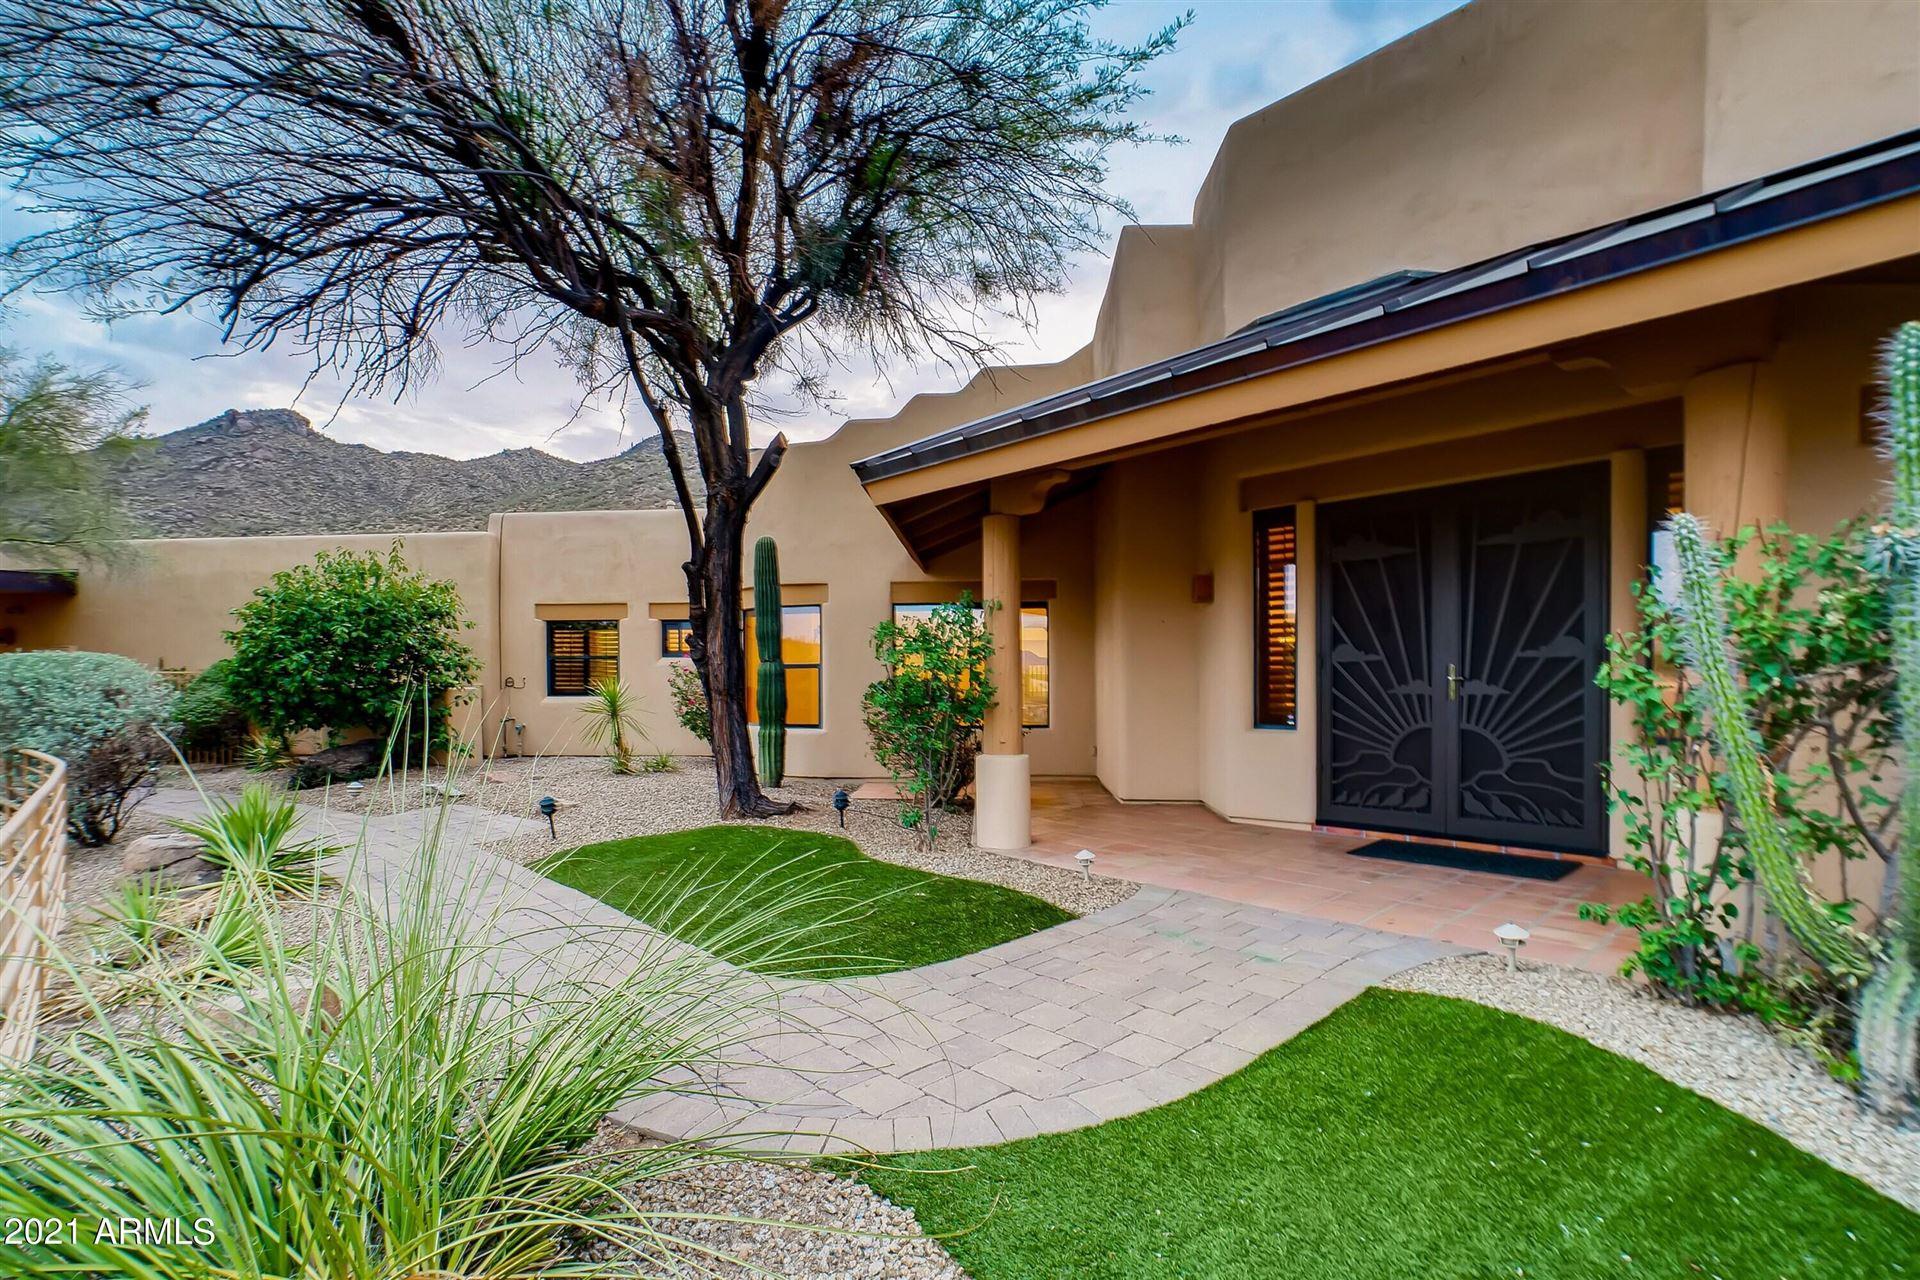 Photo of 37450 N NEVER MIND Trail, Carefree, AZ 85377 (MLS # 6263530)